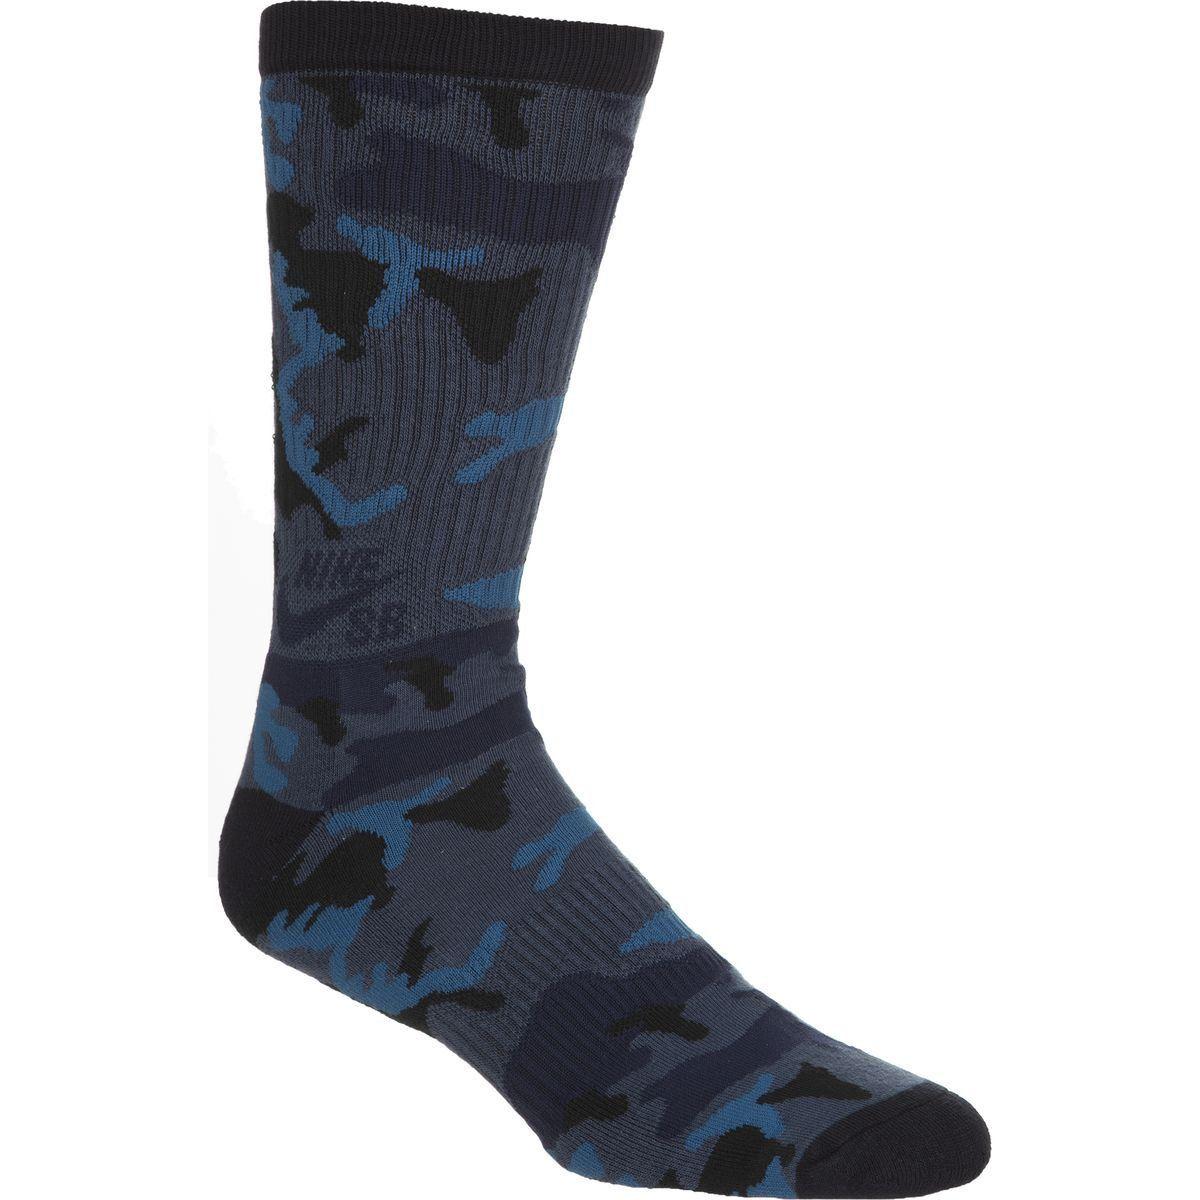 Meia Nike Skate Camuflada Azul